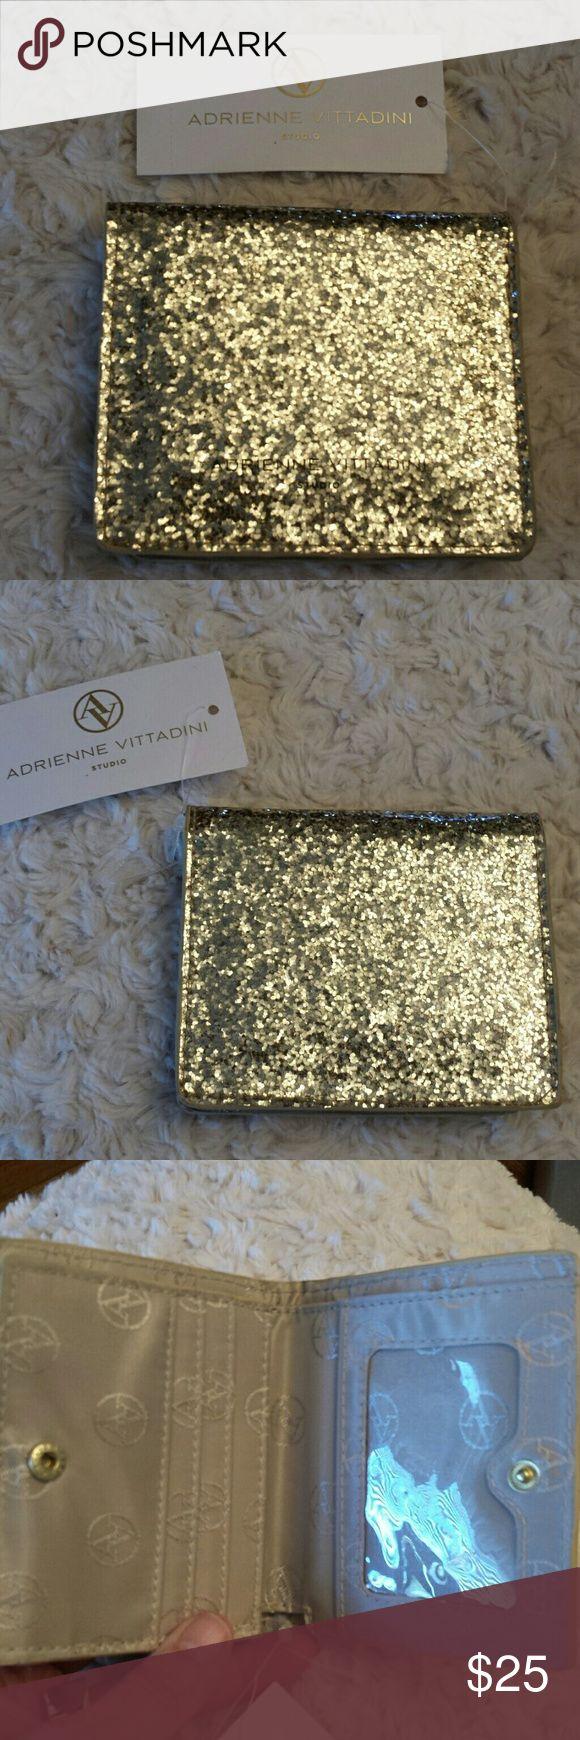 Adrienne Vittadini NWT Gold Glitter Fold Wallet Adrienne Vittadini NWT Gold Glitter Fold out Wallet, Snap closure 3 Slots inside, ID Holder Inside, Bill Slot inside Adrienne Vittadini  Bags Wallets